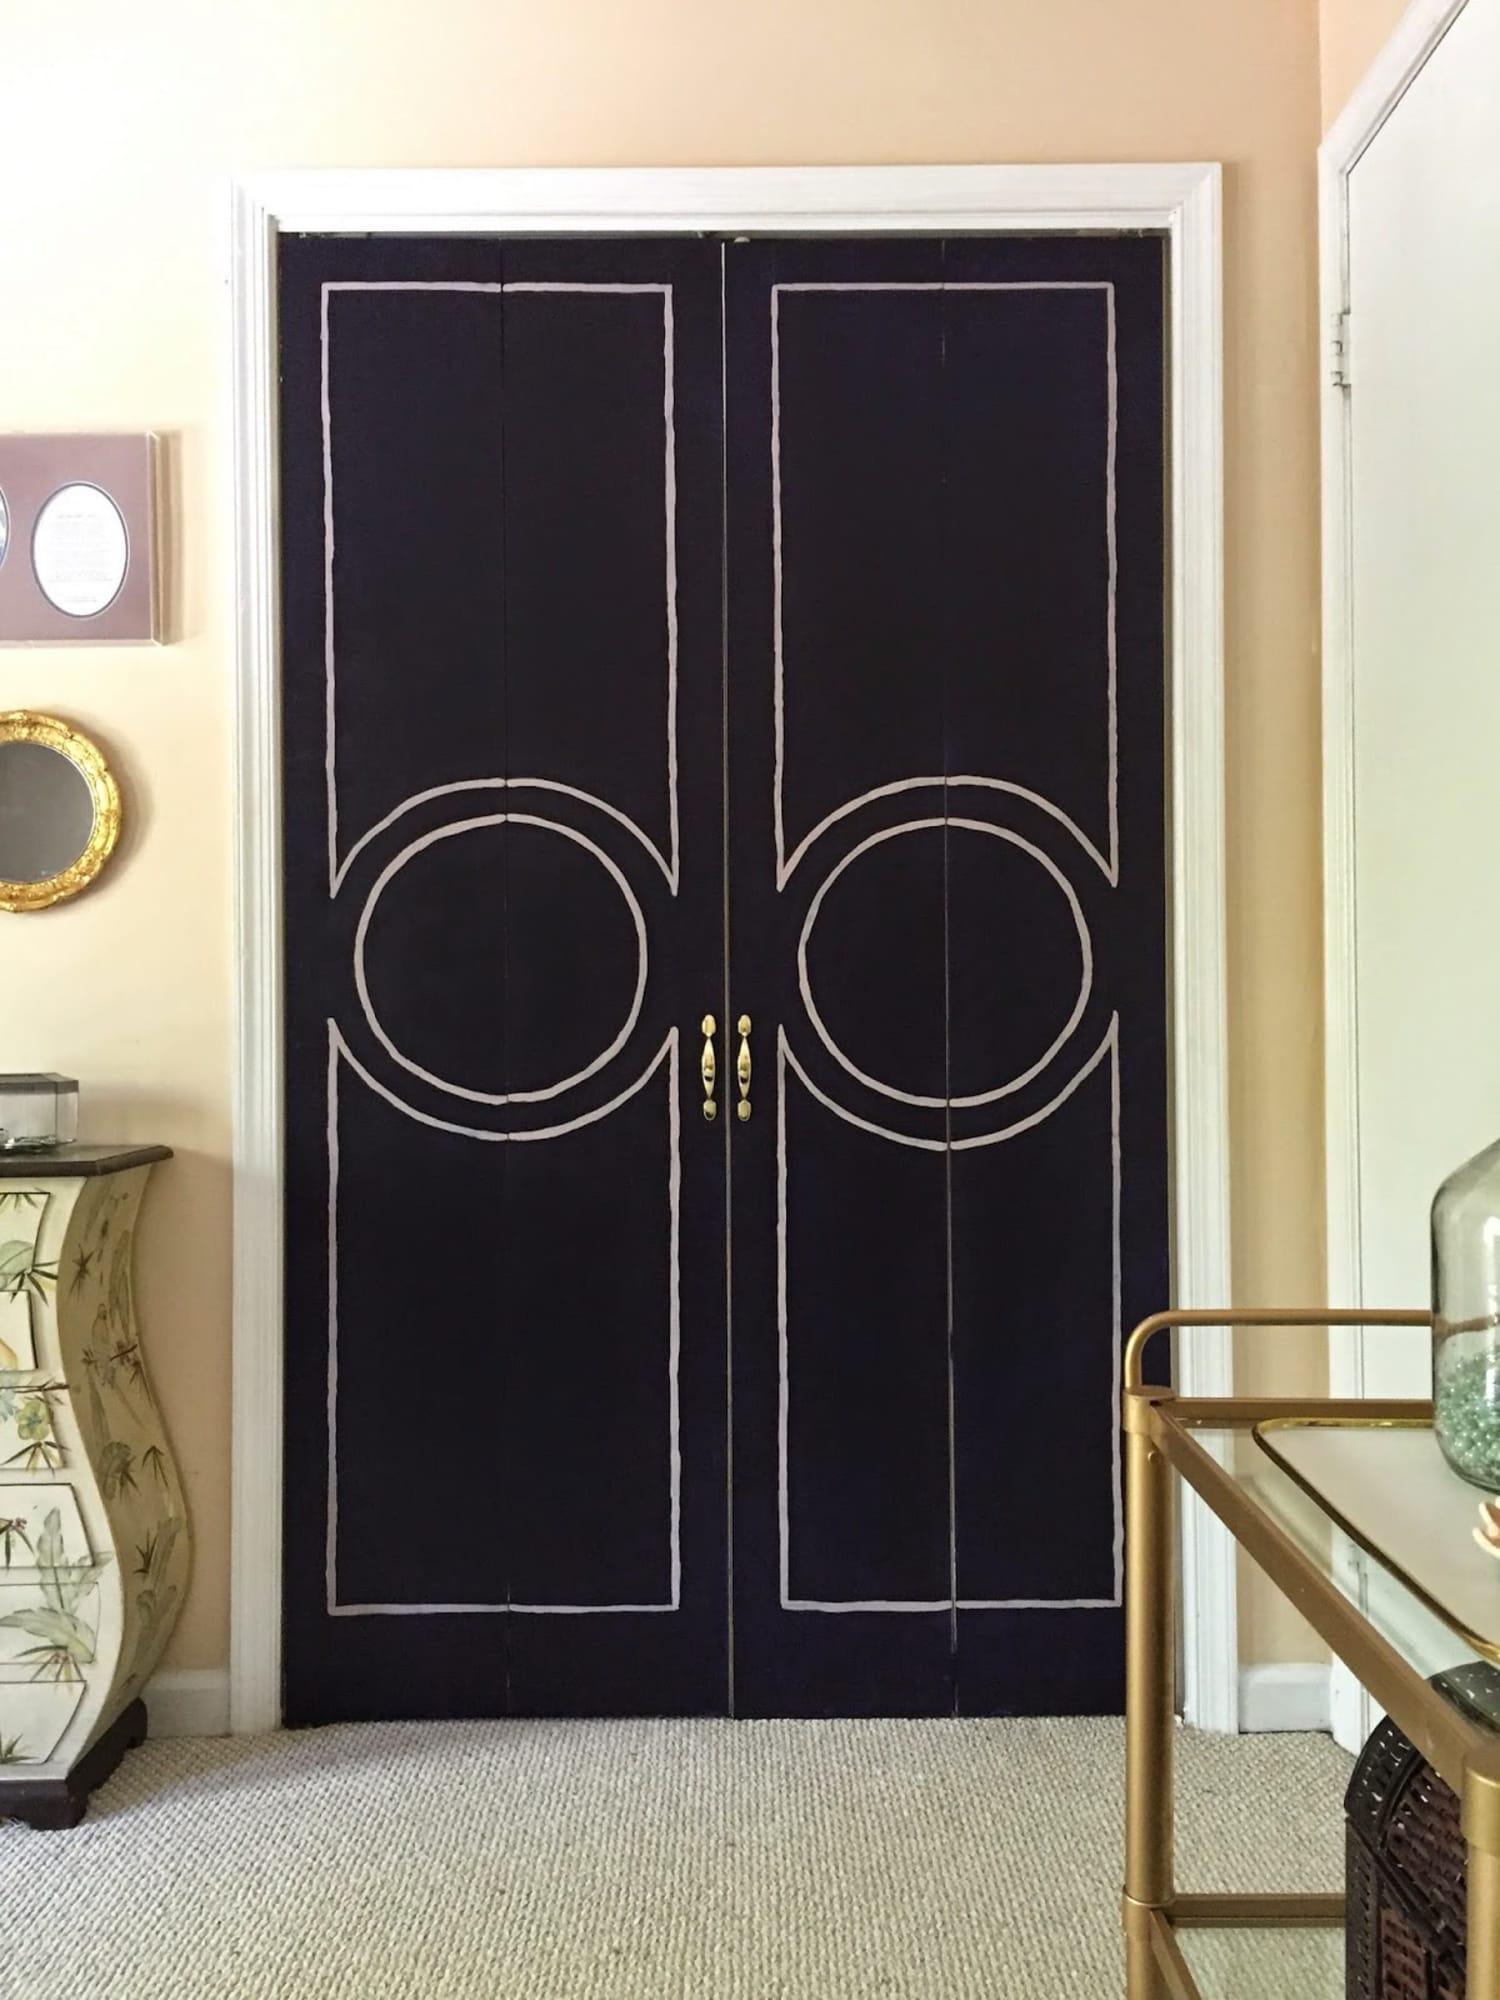 Closet Door DIY Projects That Look Like a Million Bucks ...